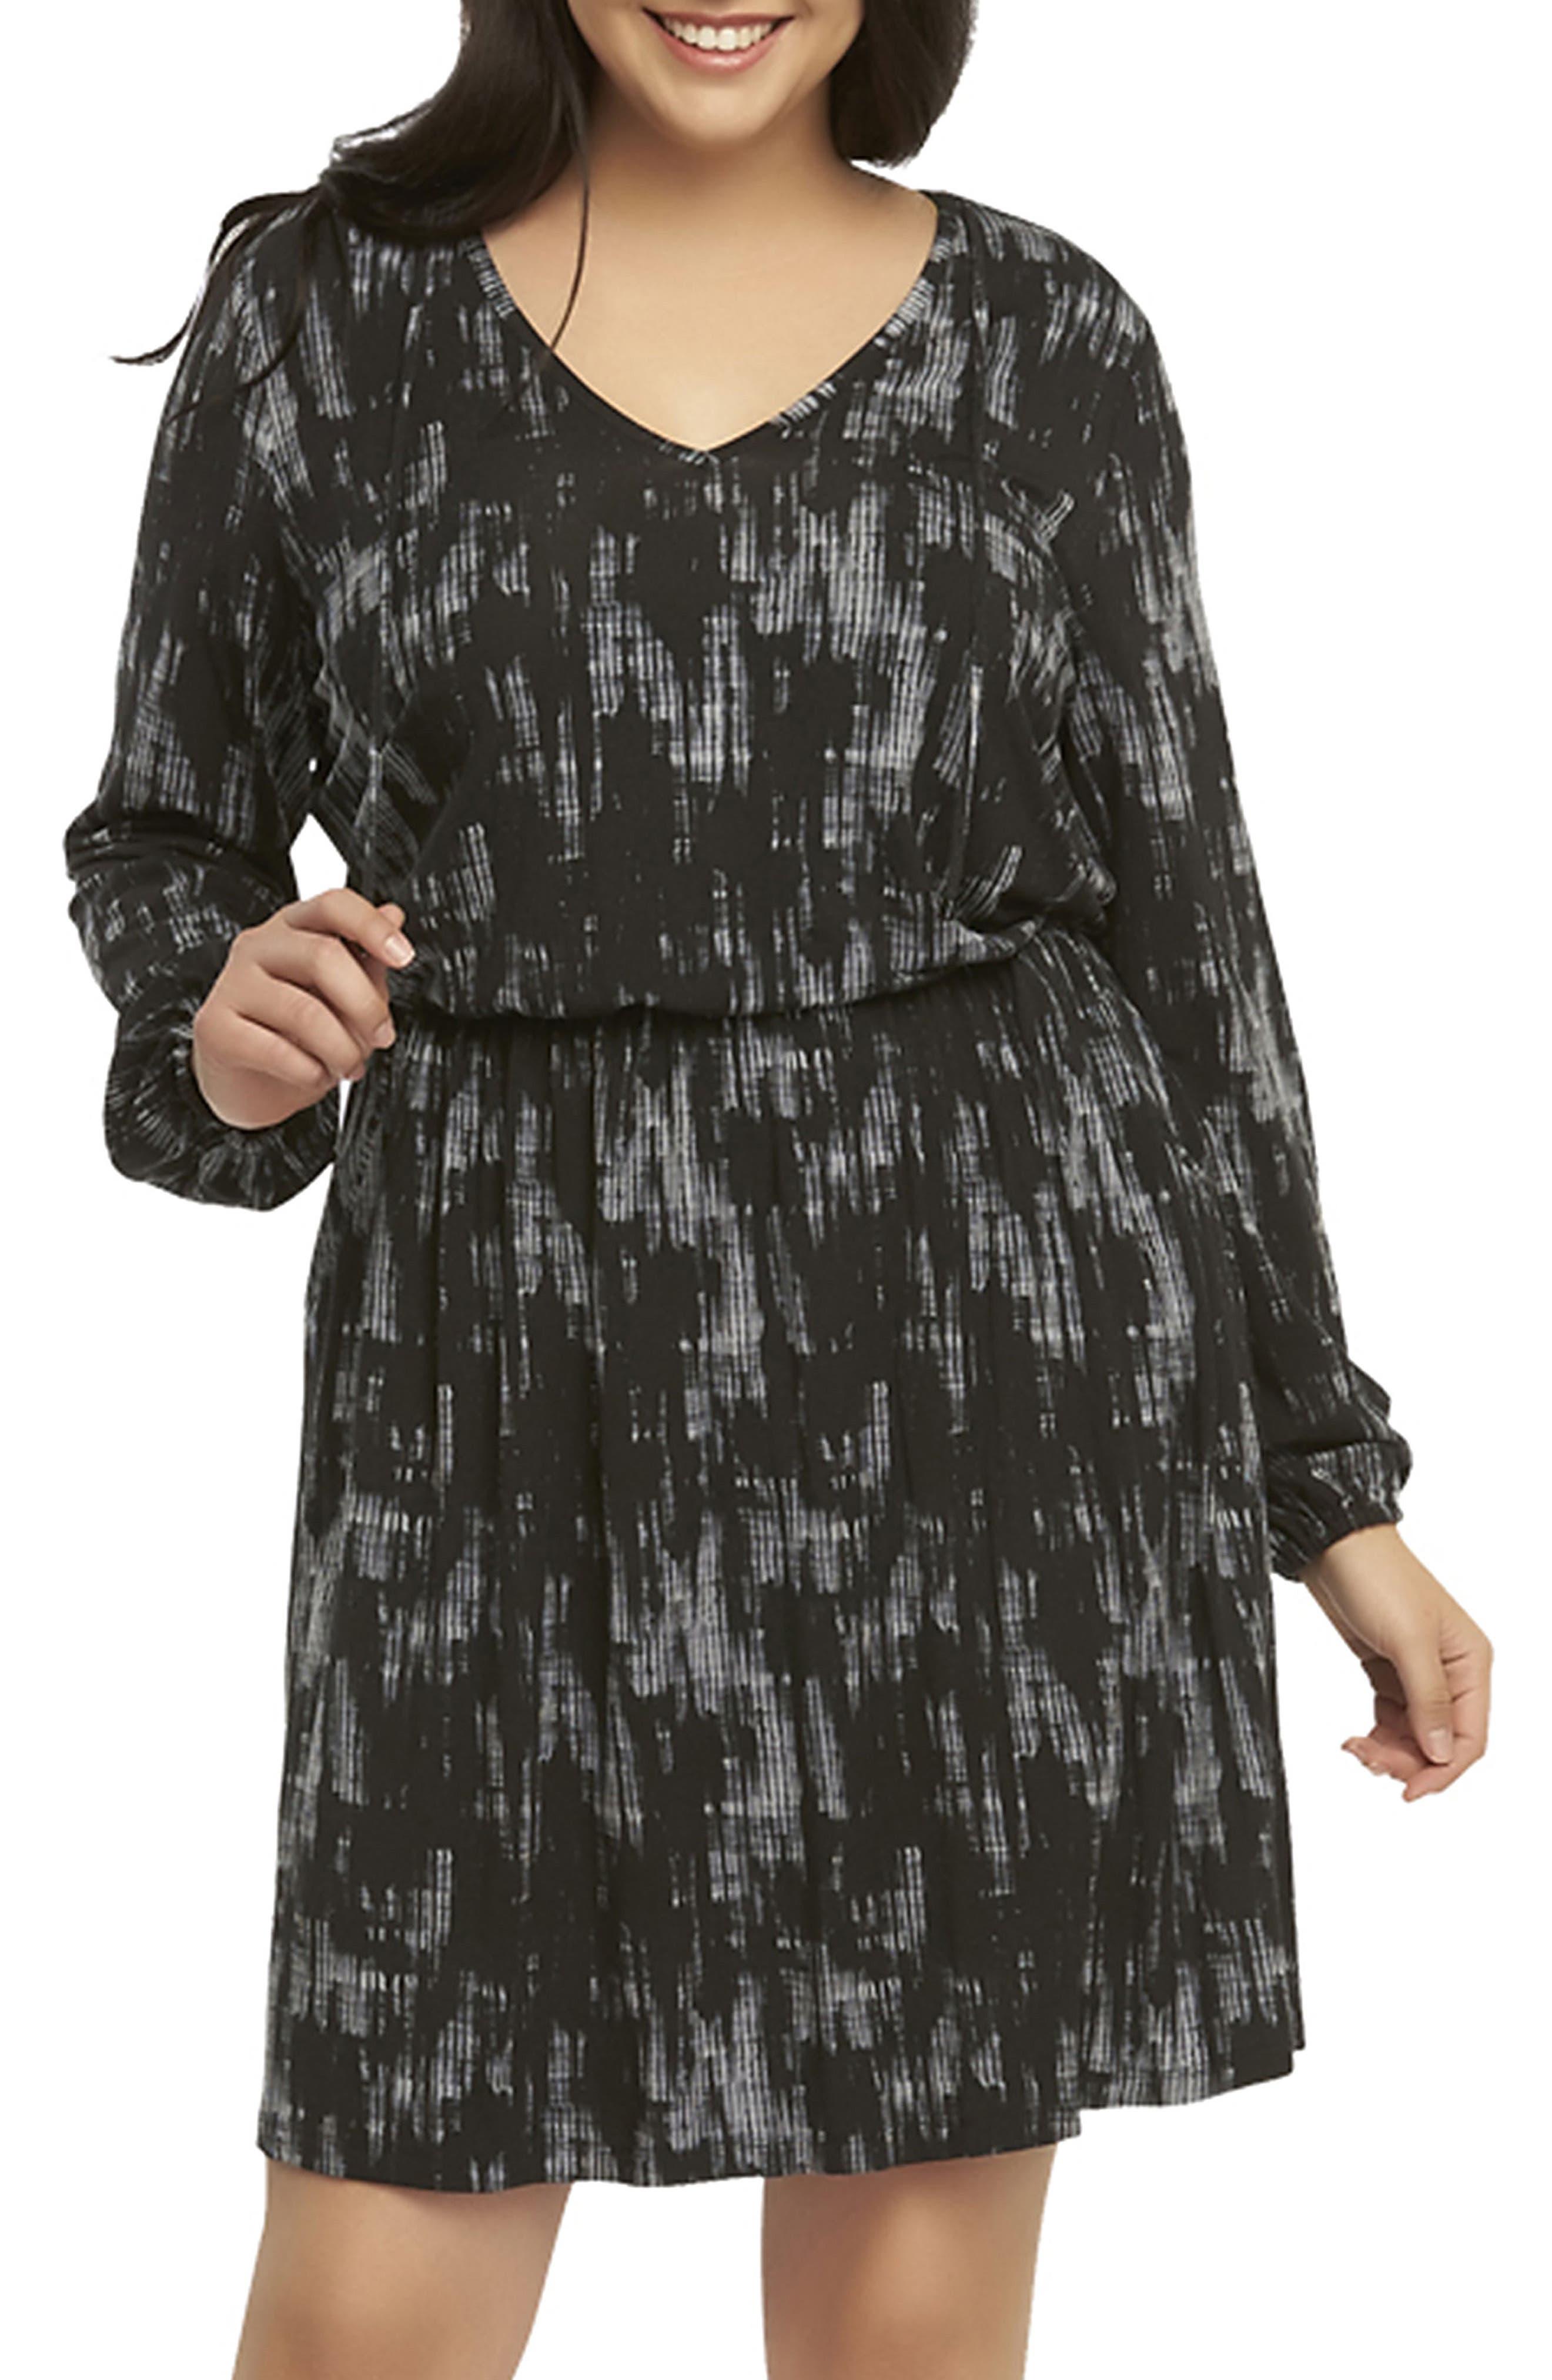 Main Image - Tart 'Robby' Print Jersey V-Neck Dress (Plus Size)